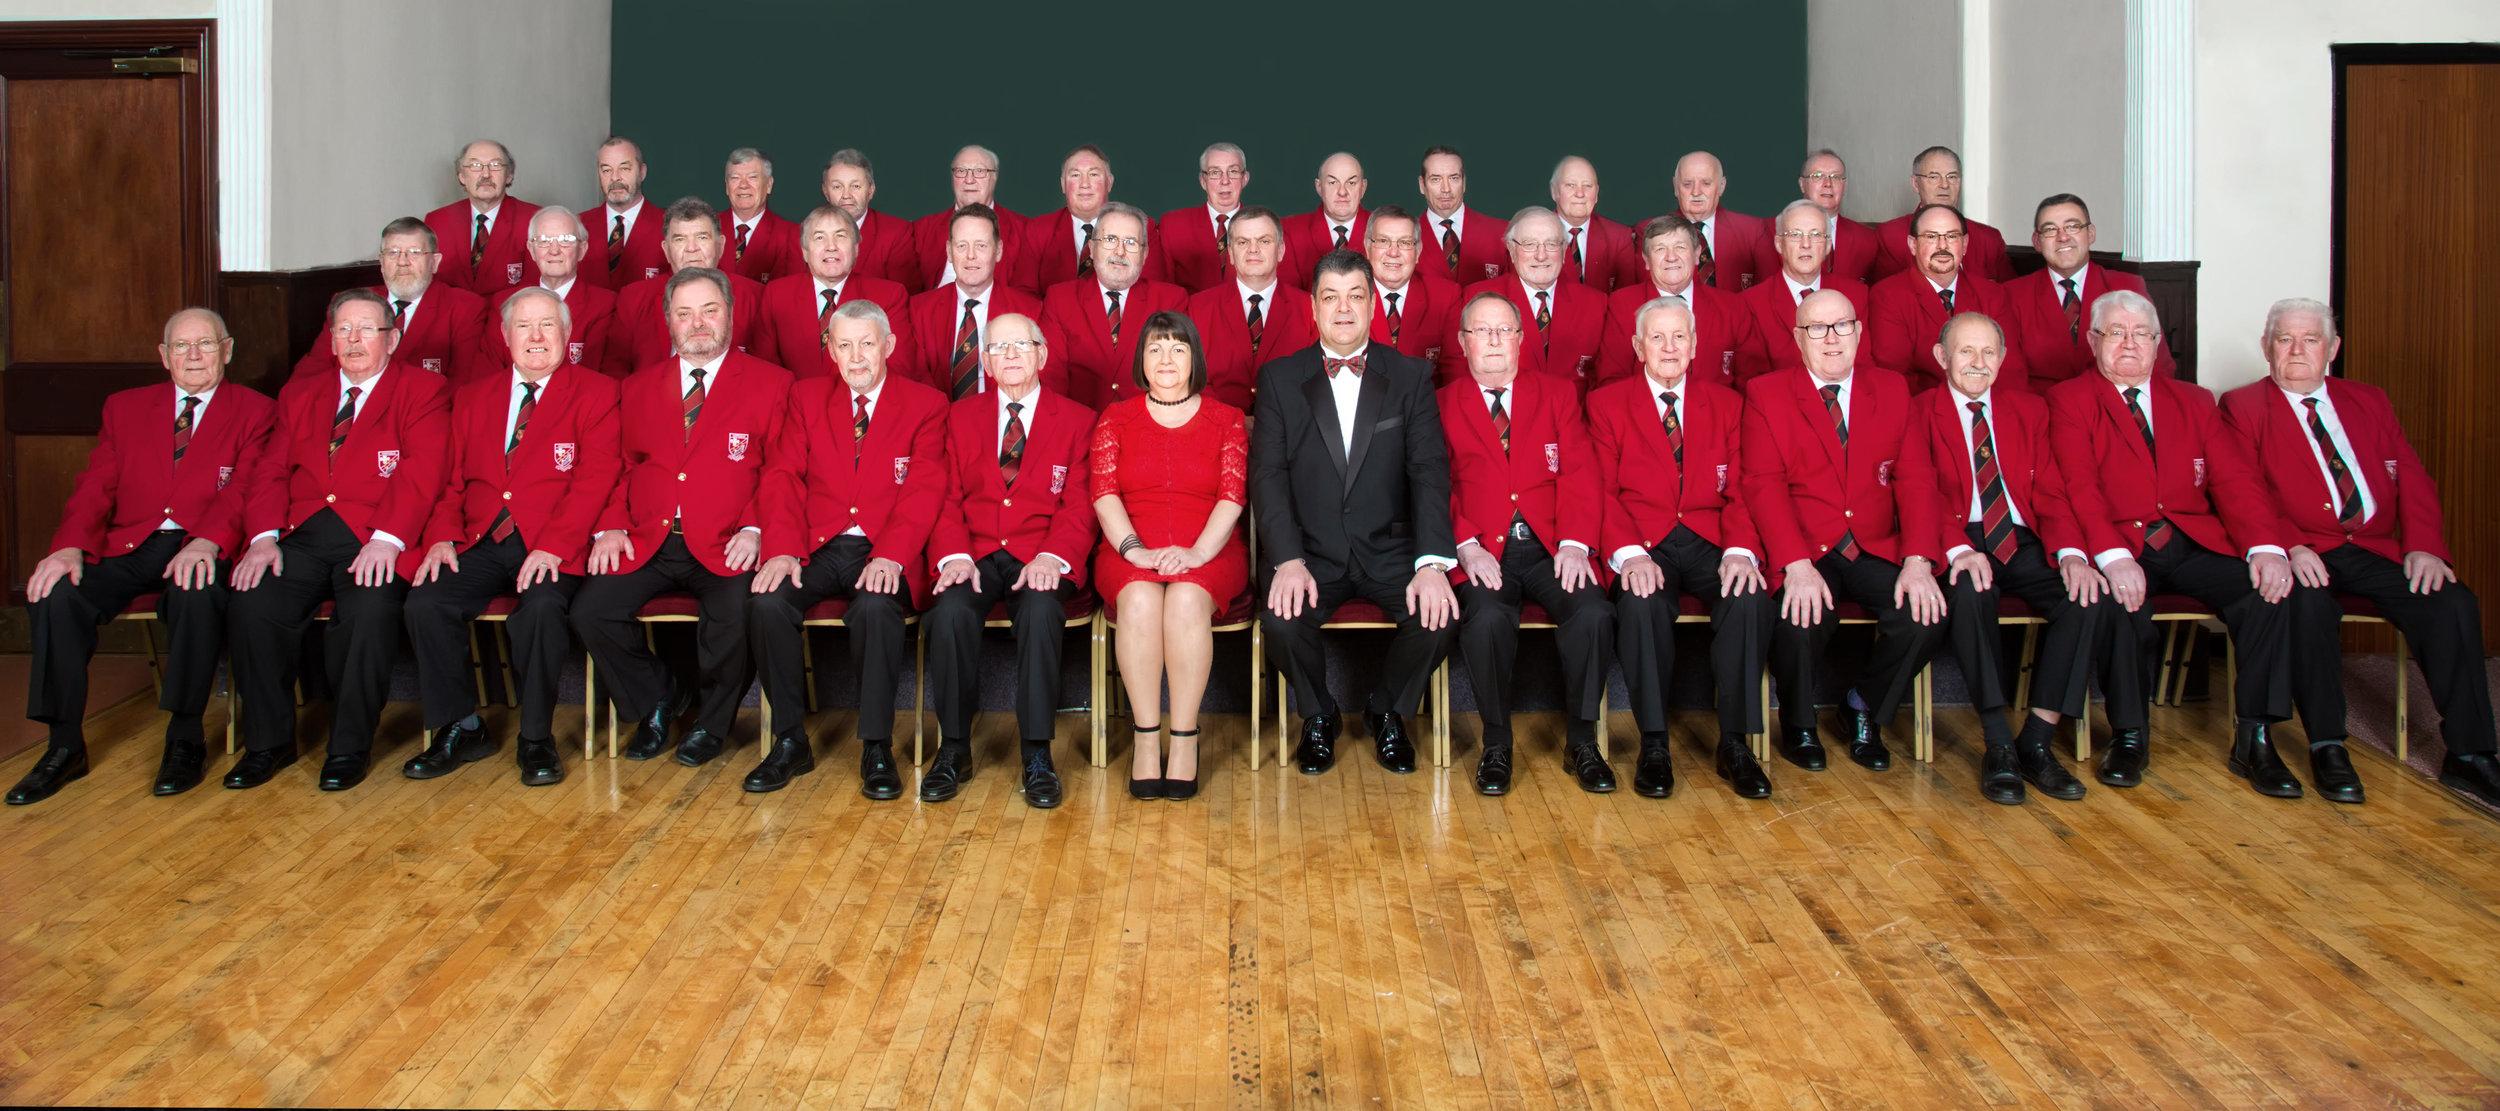 Tredegar Orpheus Male Voice Choir Photo.jpg